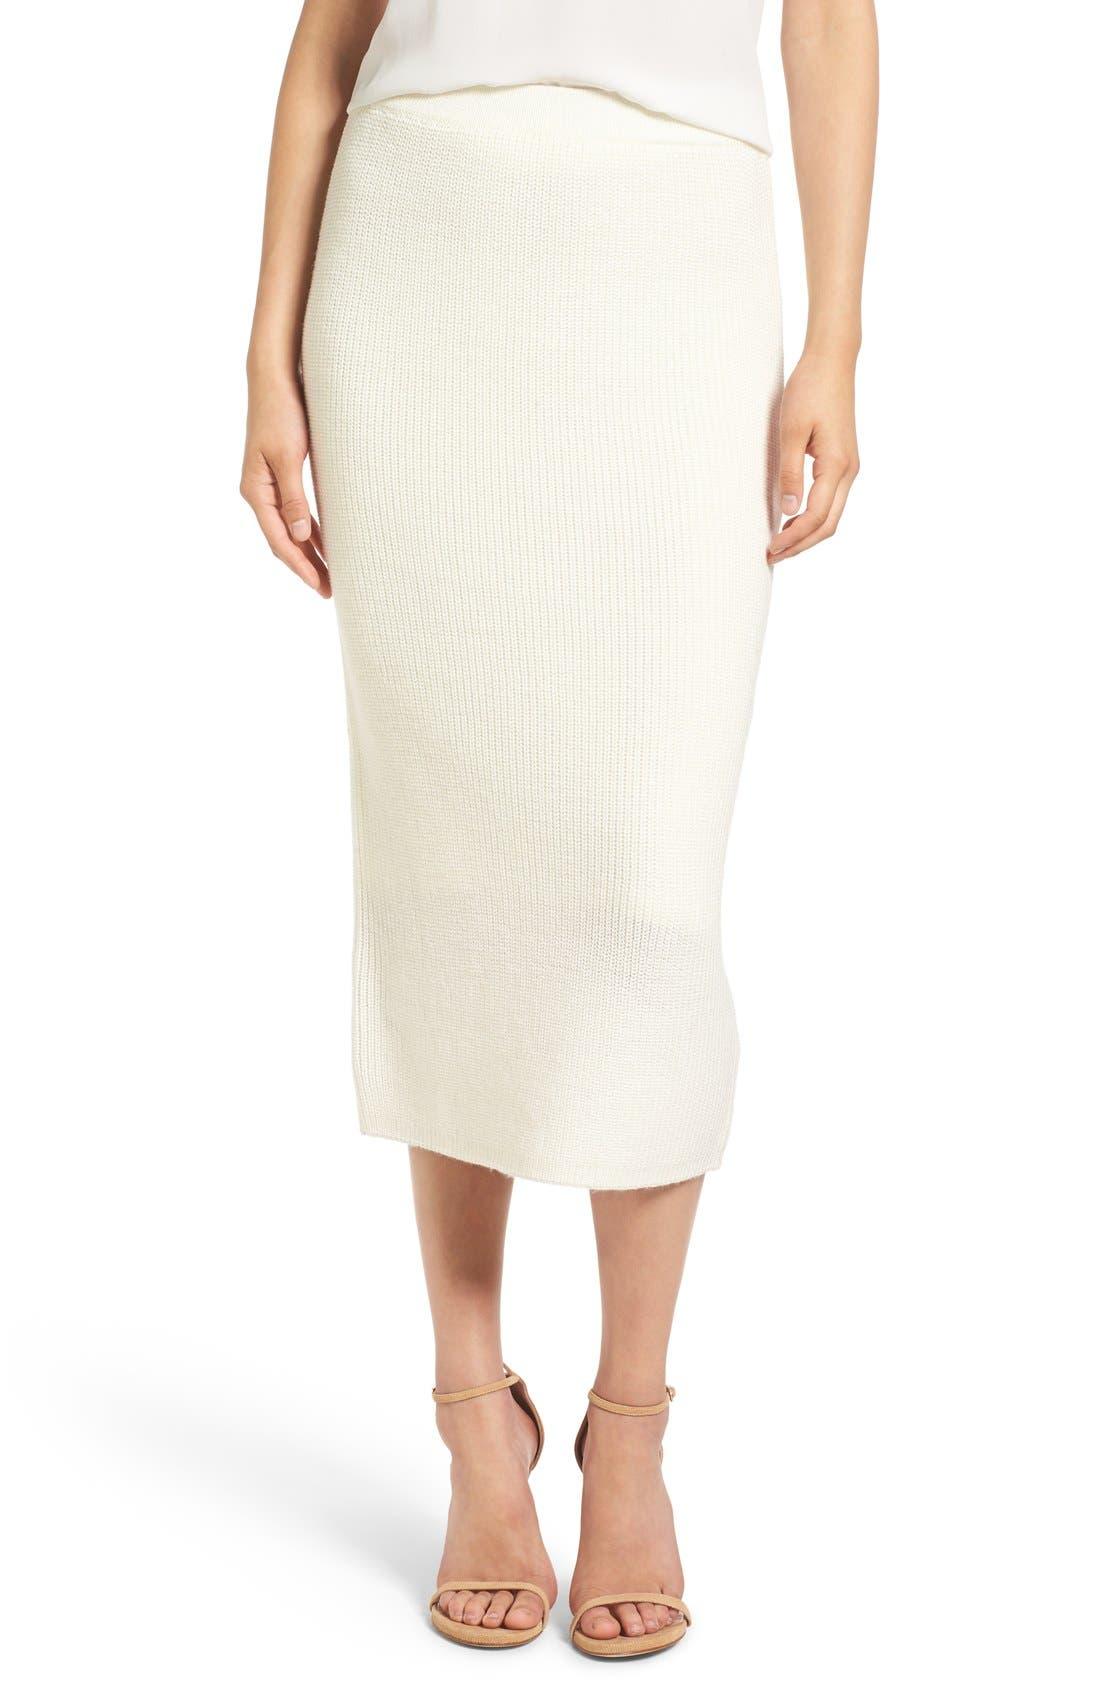 by Lauren Conrad 'Copenhagen' Knit Tube Skirt,                             Main thumbnail 1, color,                             100